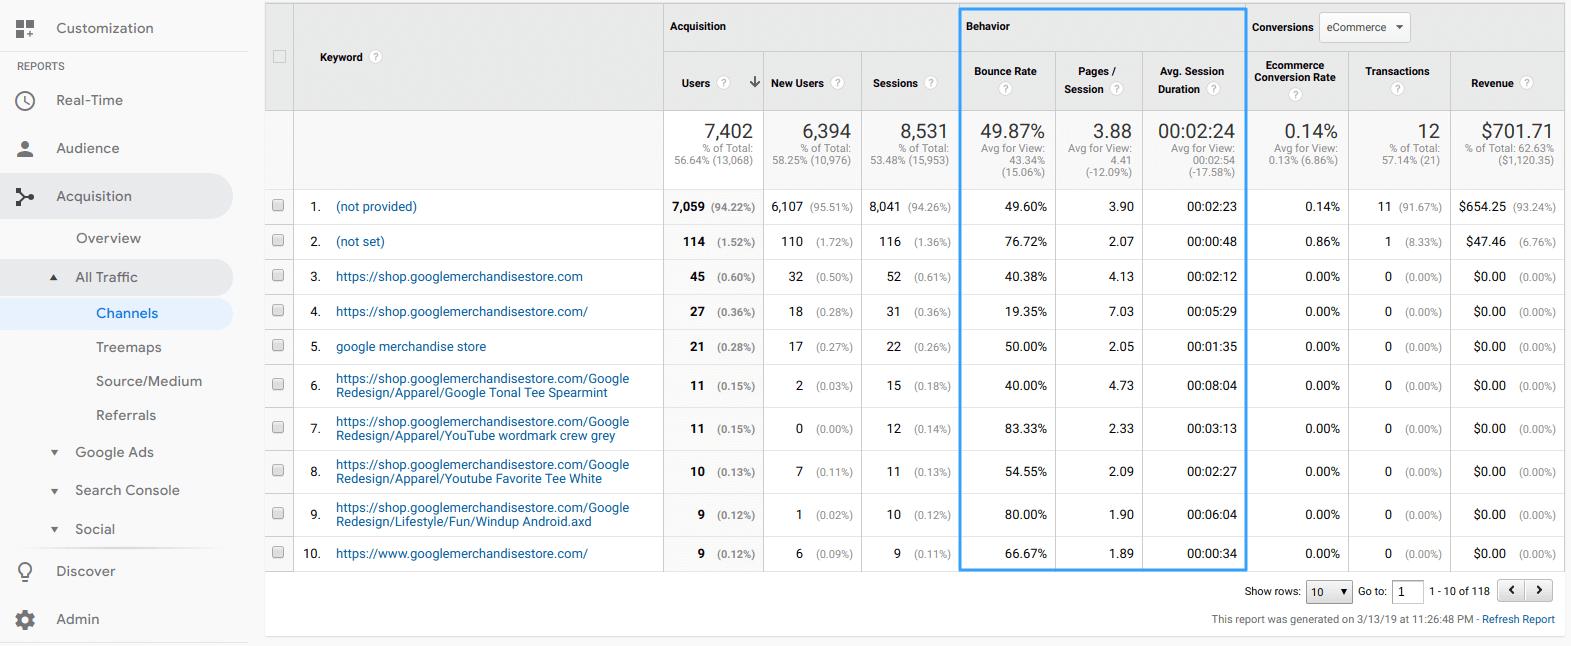 Behavior column in Google Analytics report